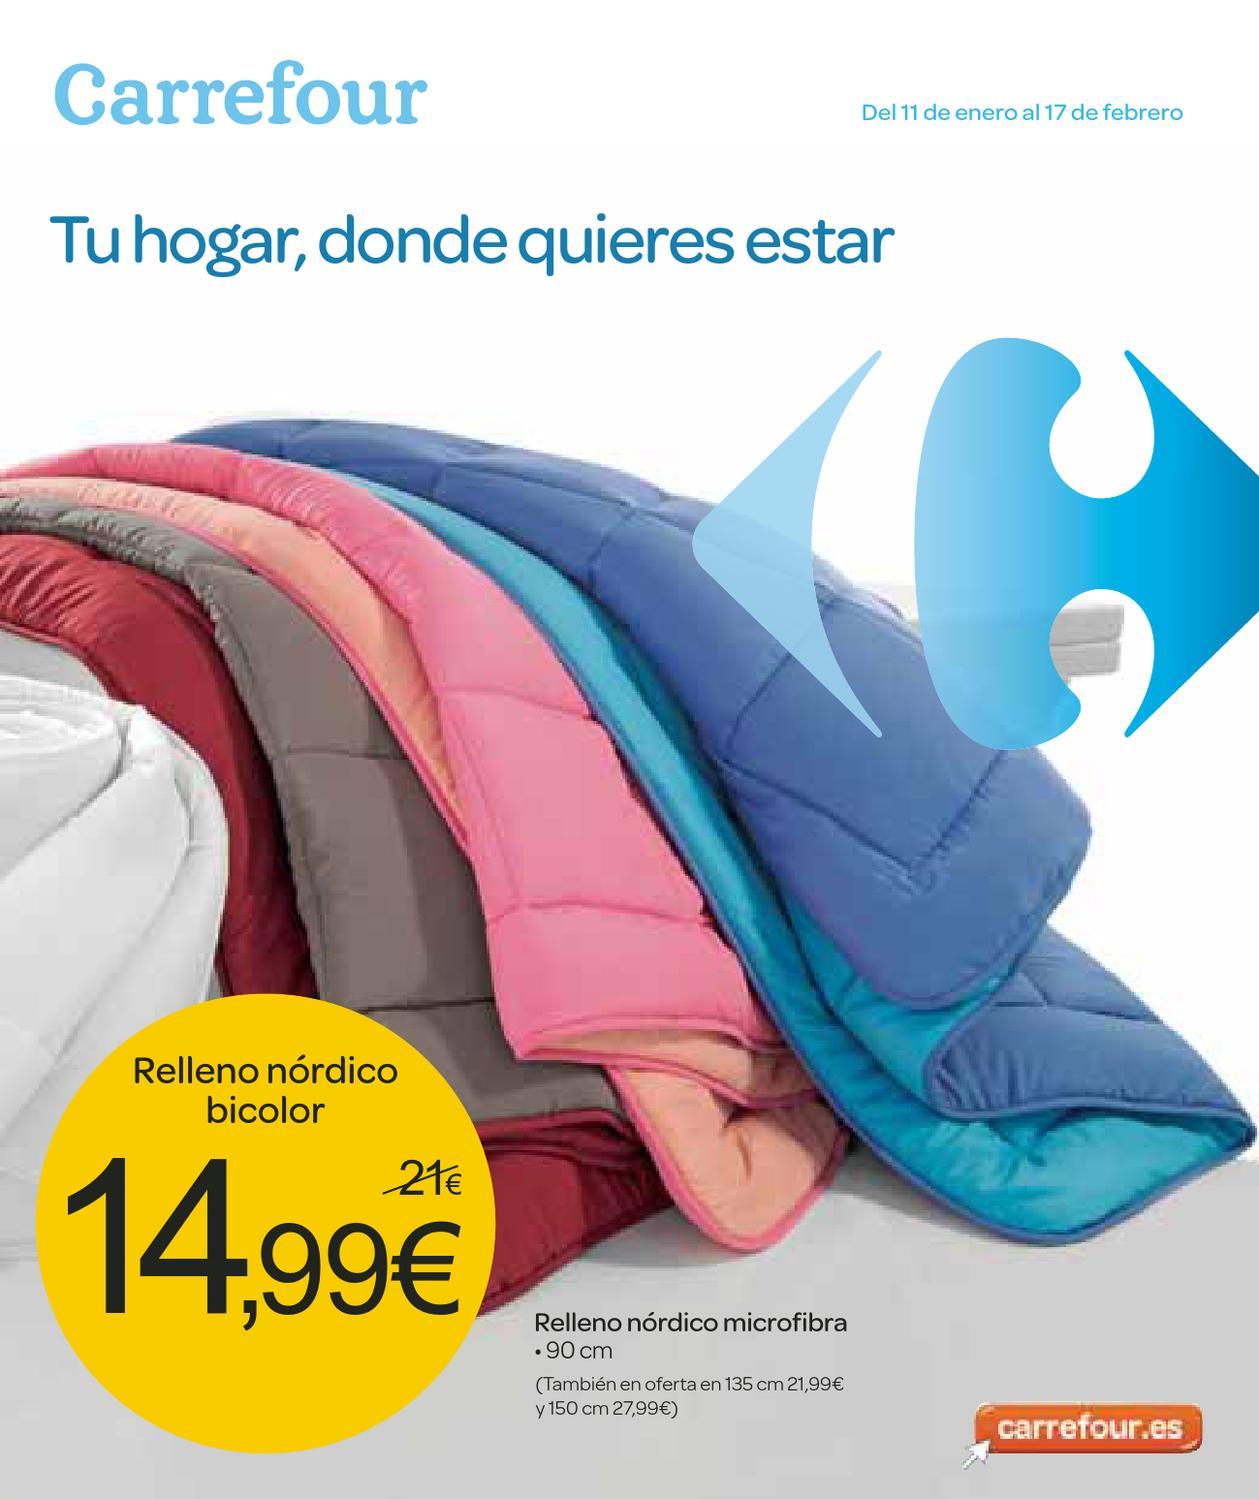 Carrefour catalogo ofertas para el hogar by hackos ecc issuu - Oferta edredones nordicos ...